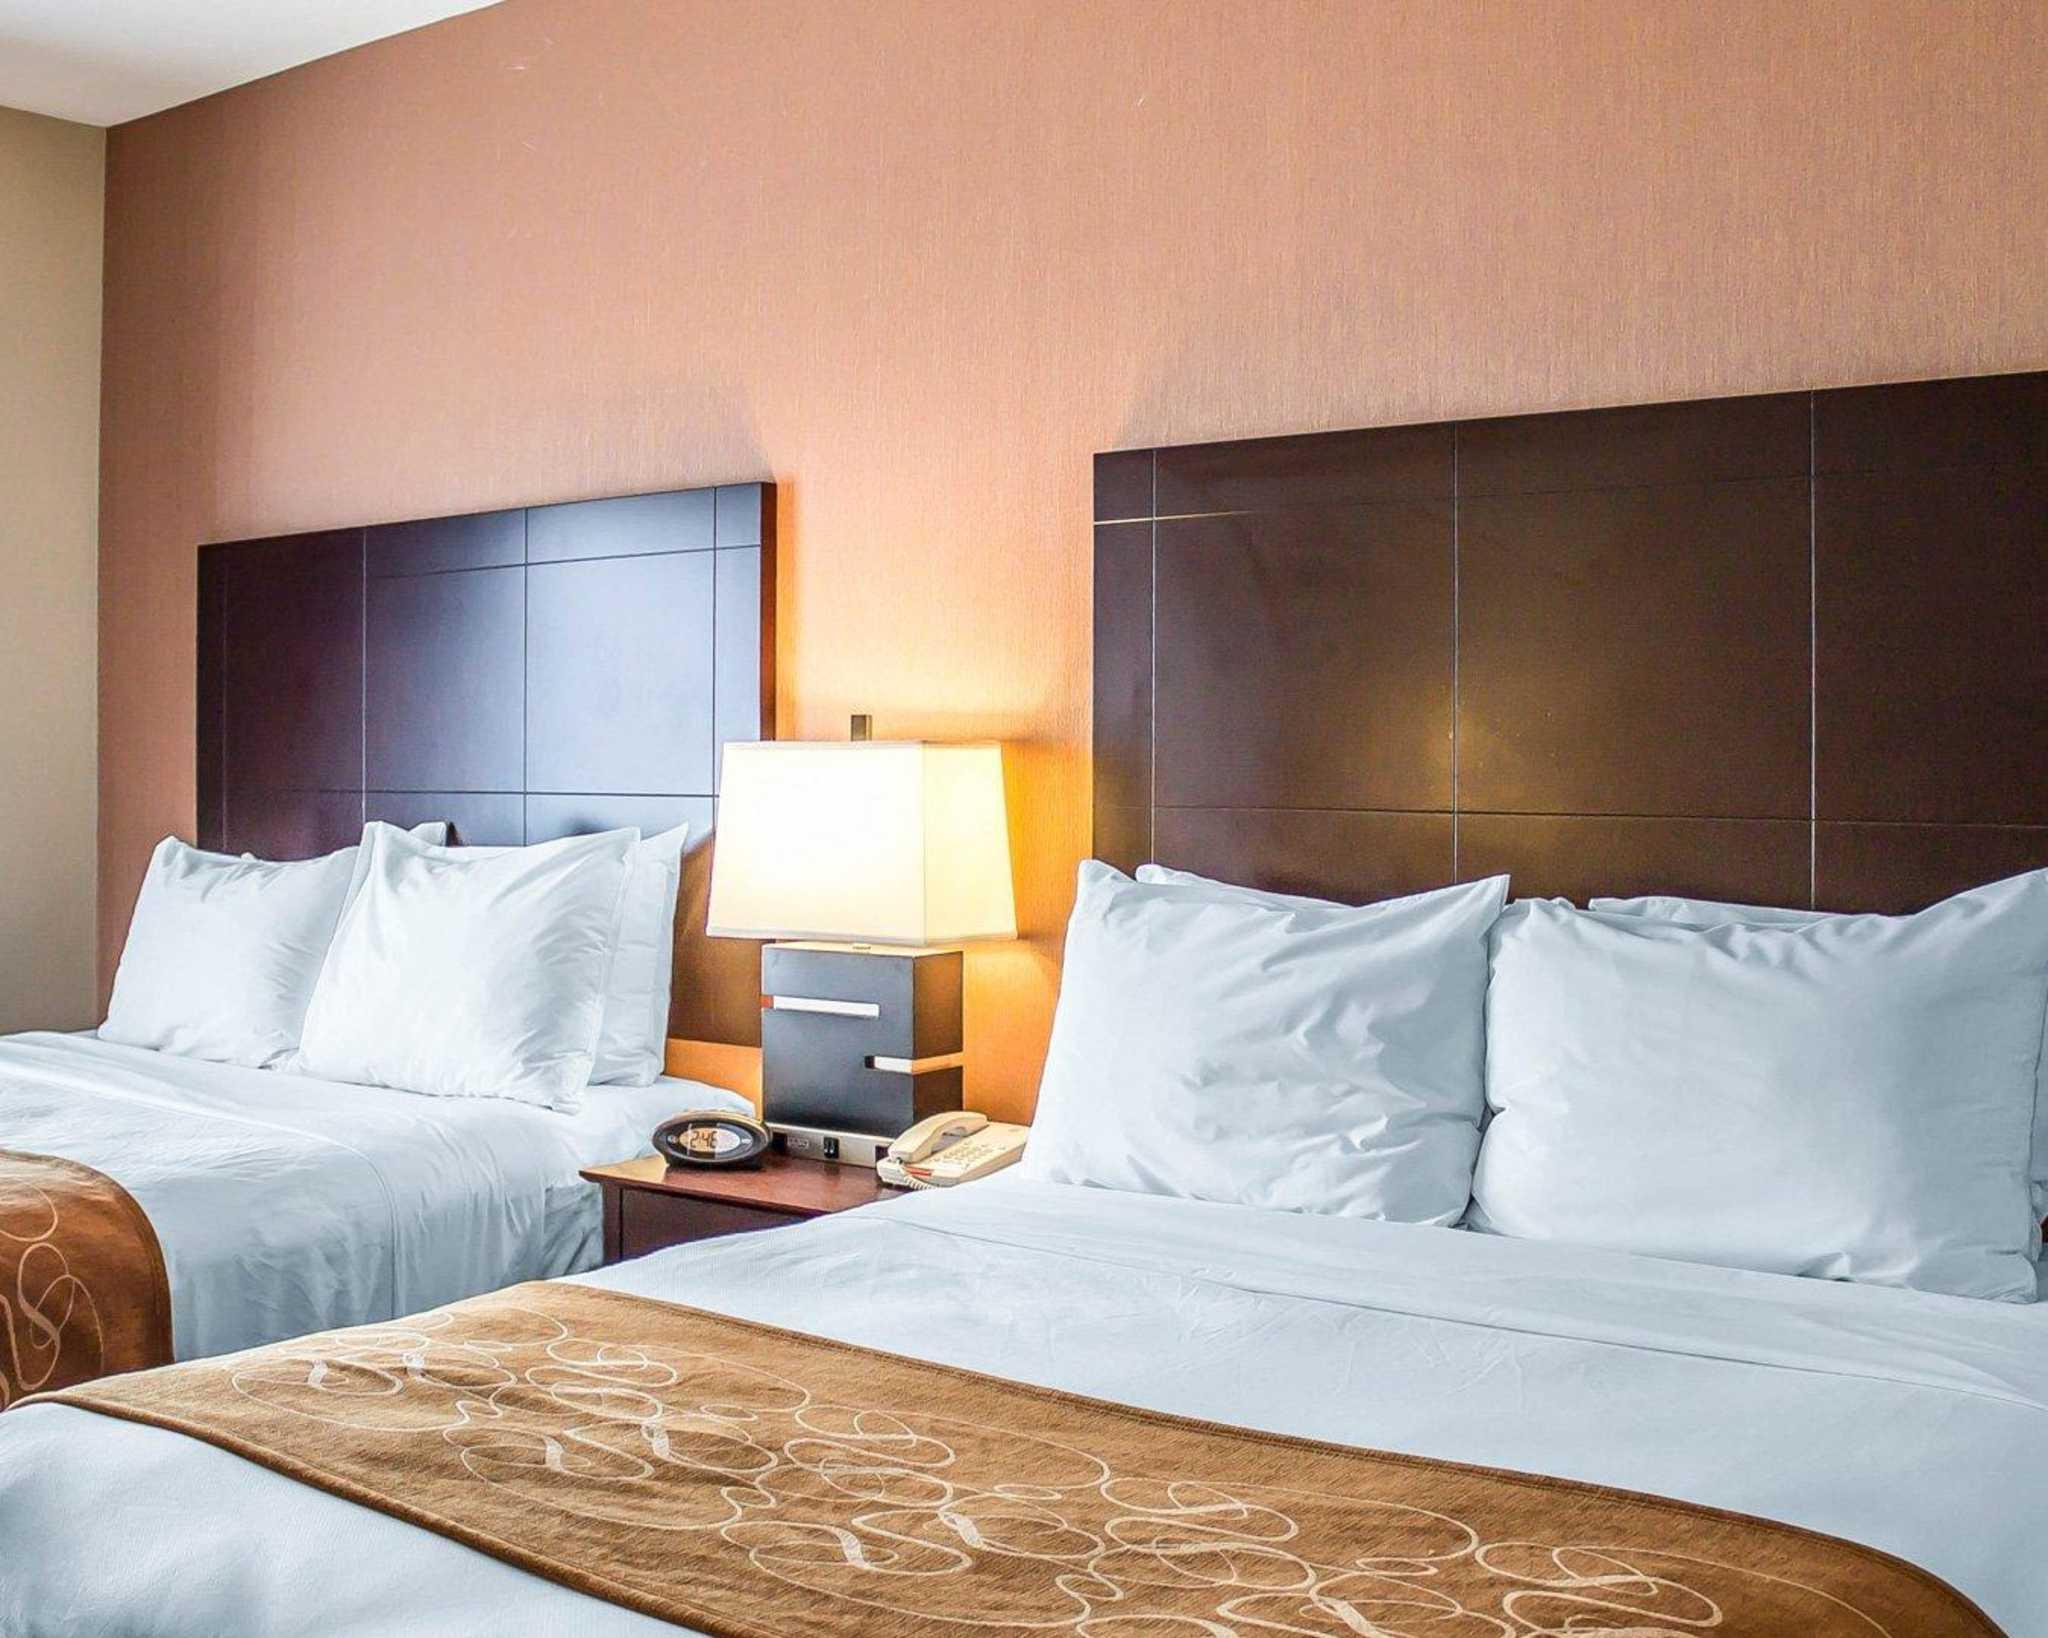 Comfort Suites Perrysburg - Toledo South image 32